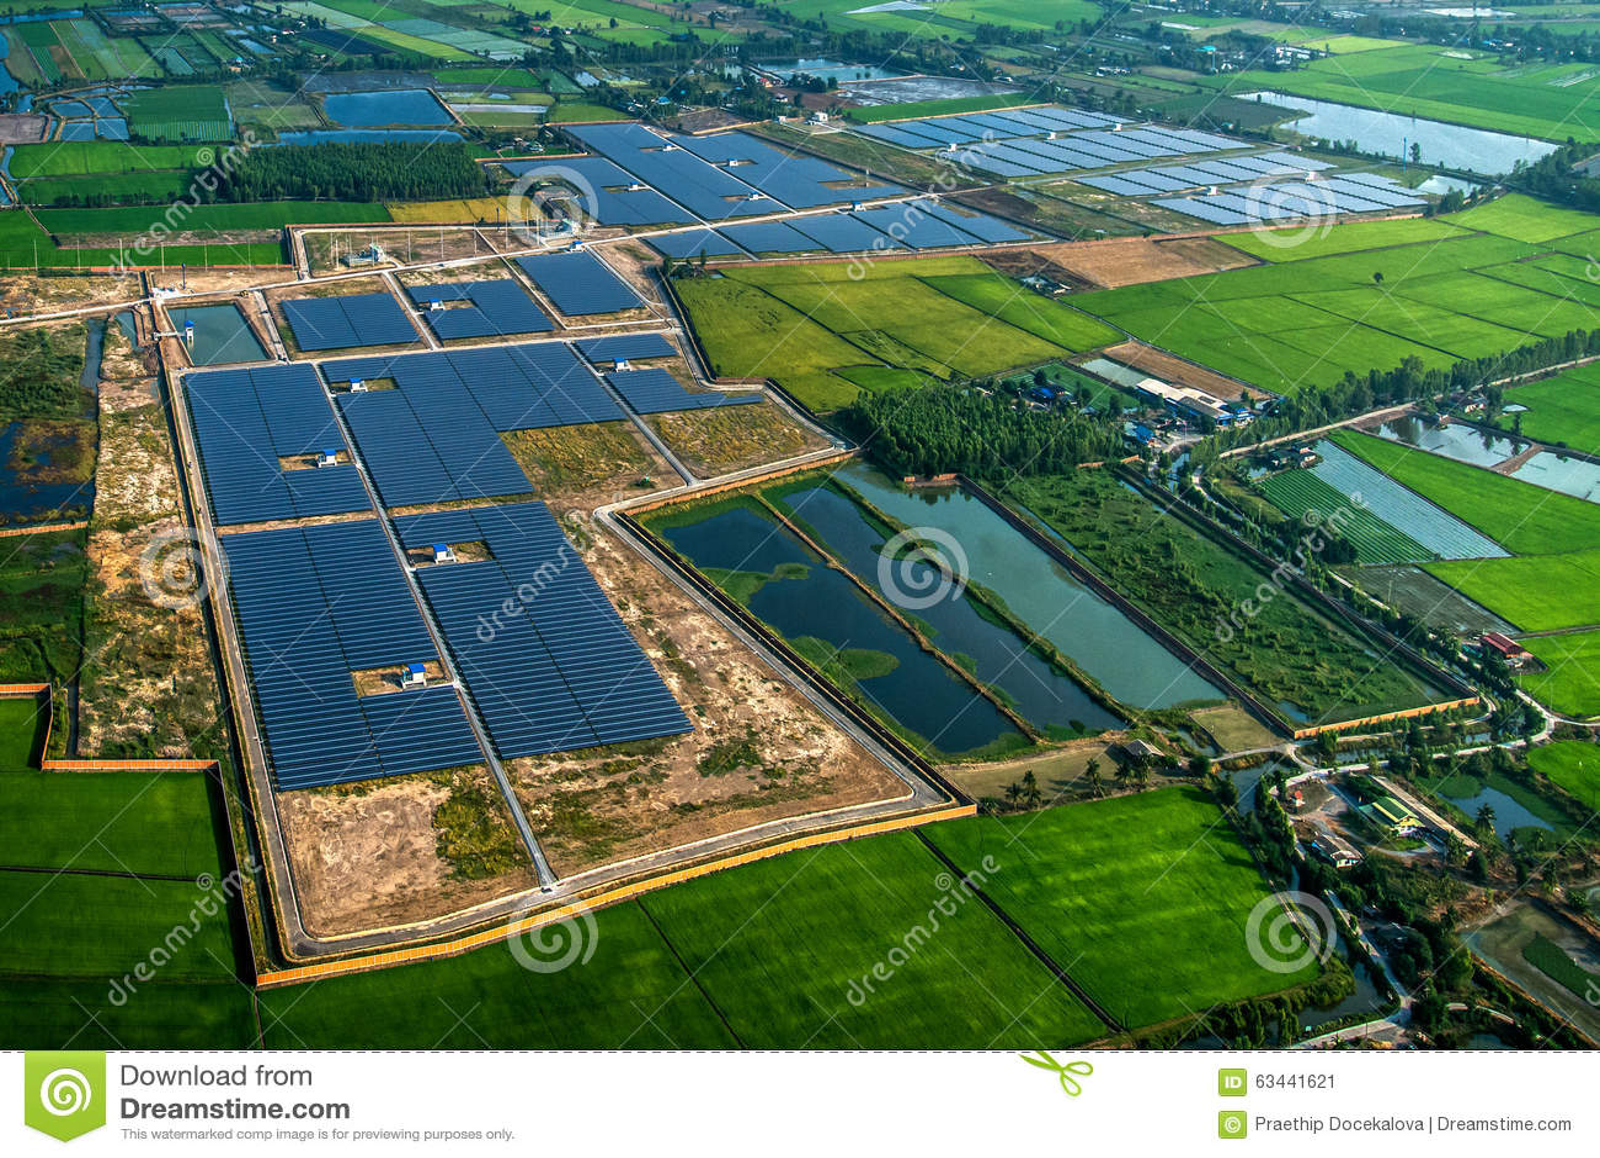 farm solar system - photo #3